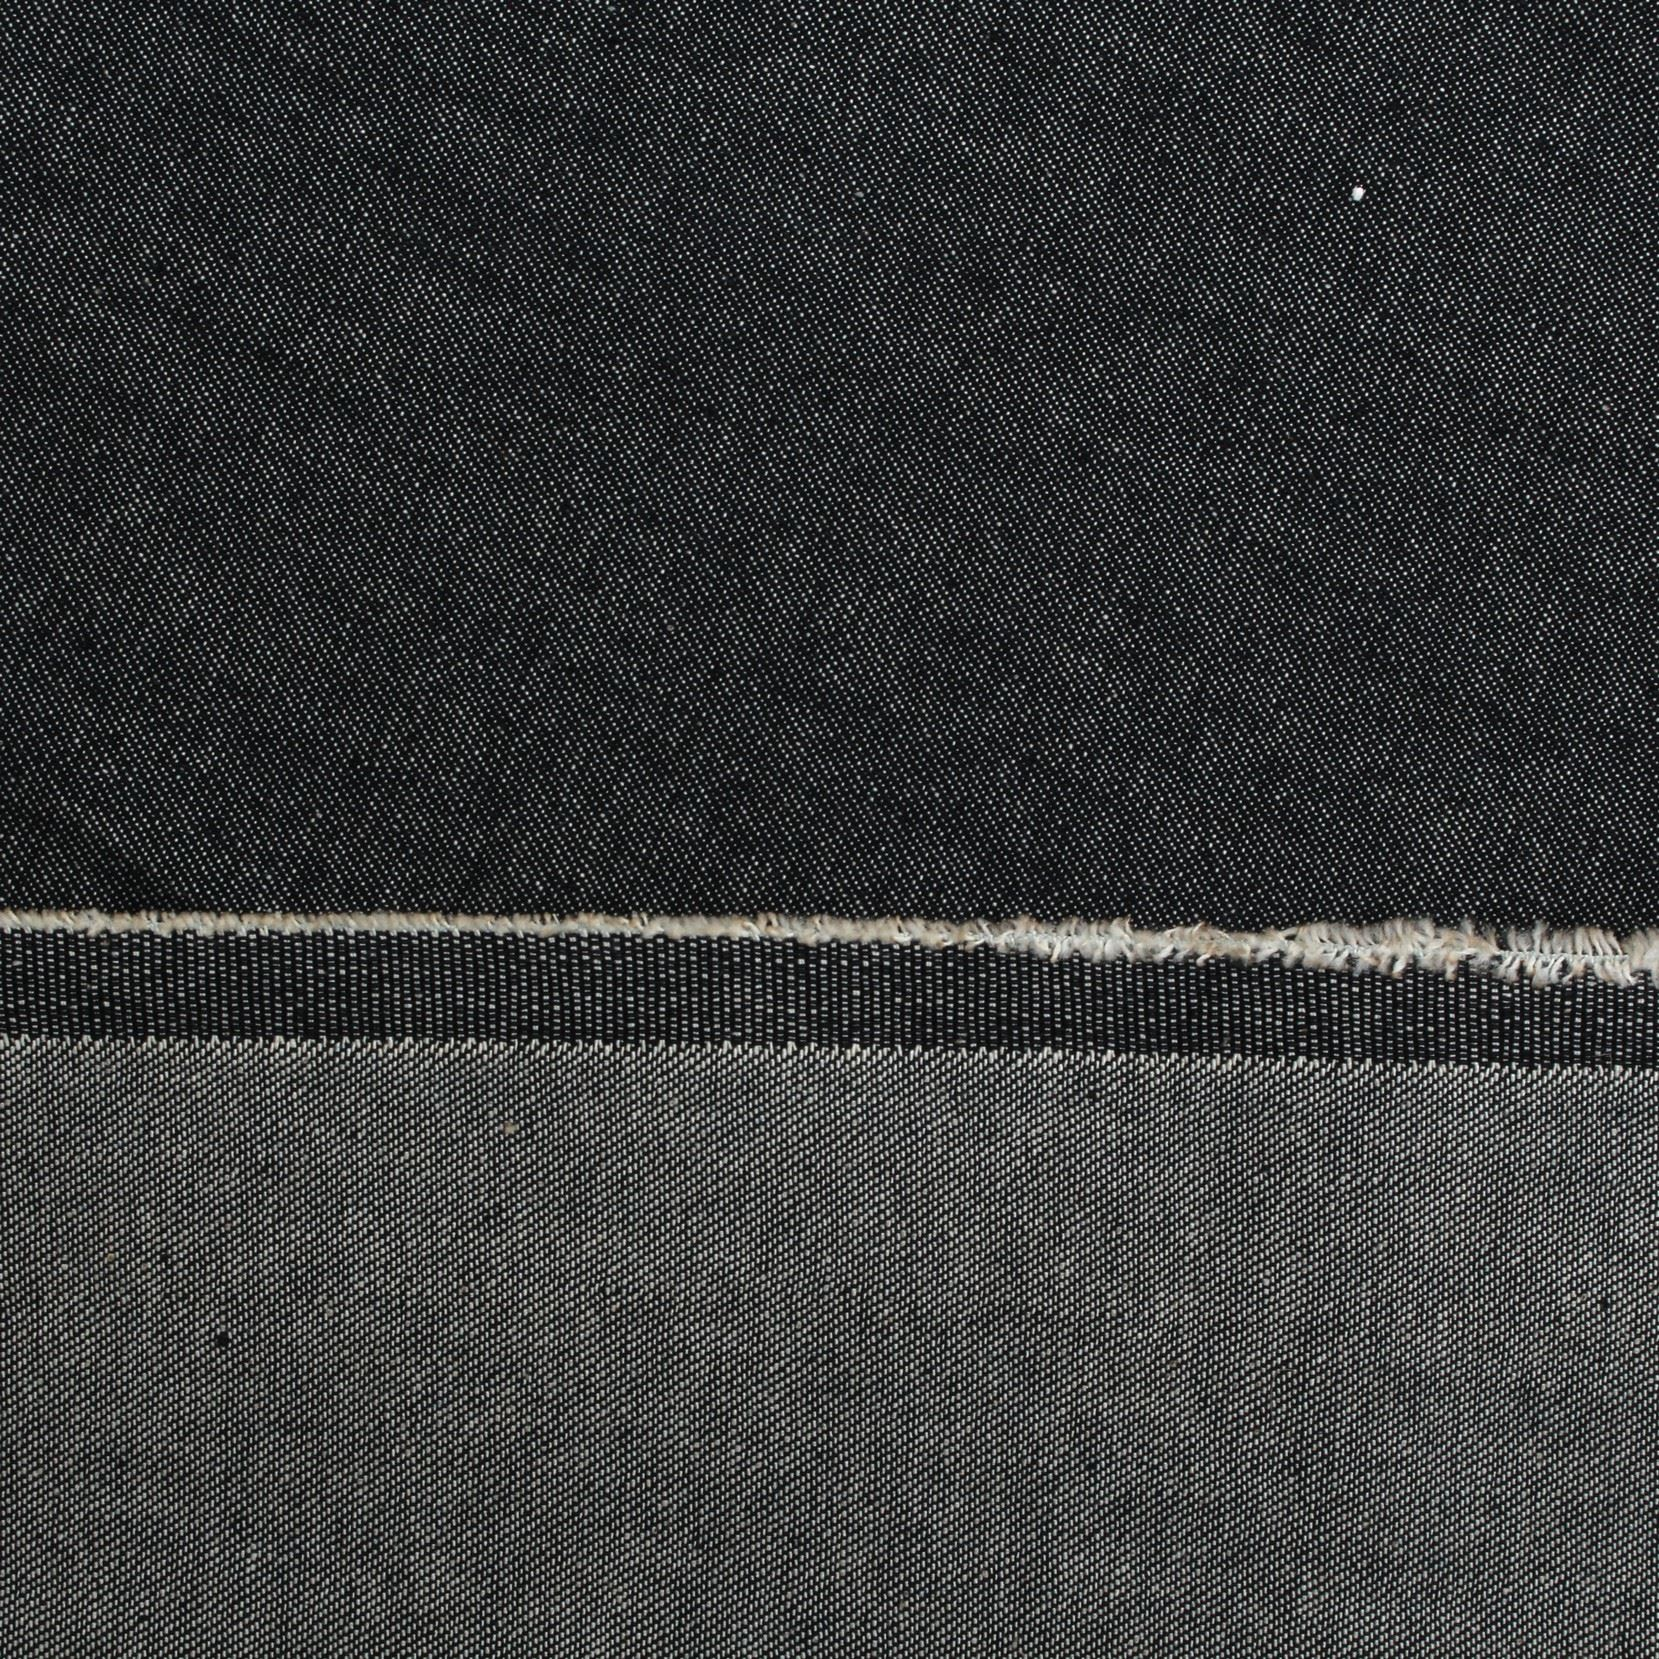 thumbnail 11 - 100% COTTON HEAVYWEIGHT WASHED DENIM CRAFT CLOTHING DRESS SEWING FABRIC